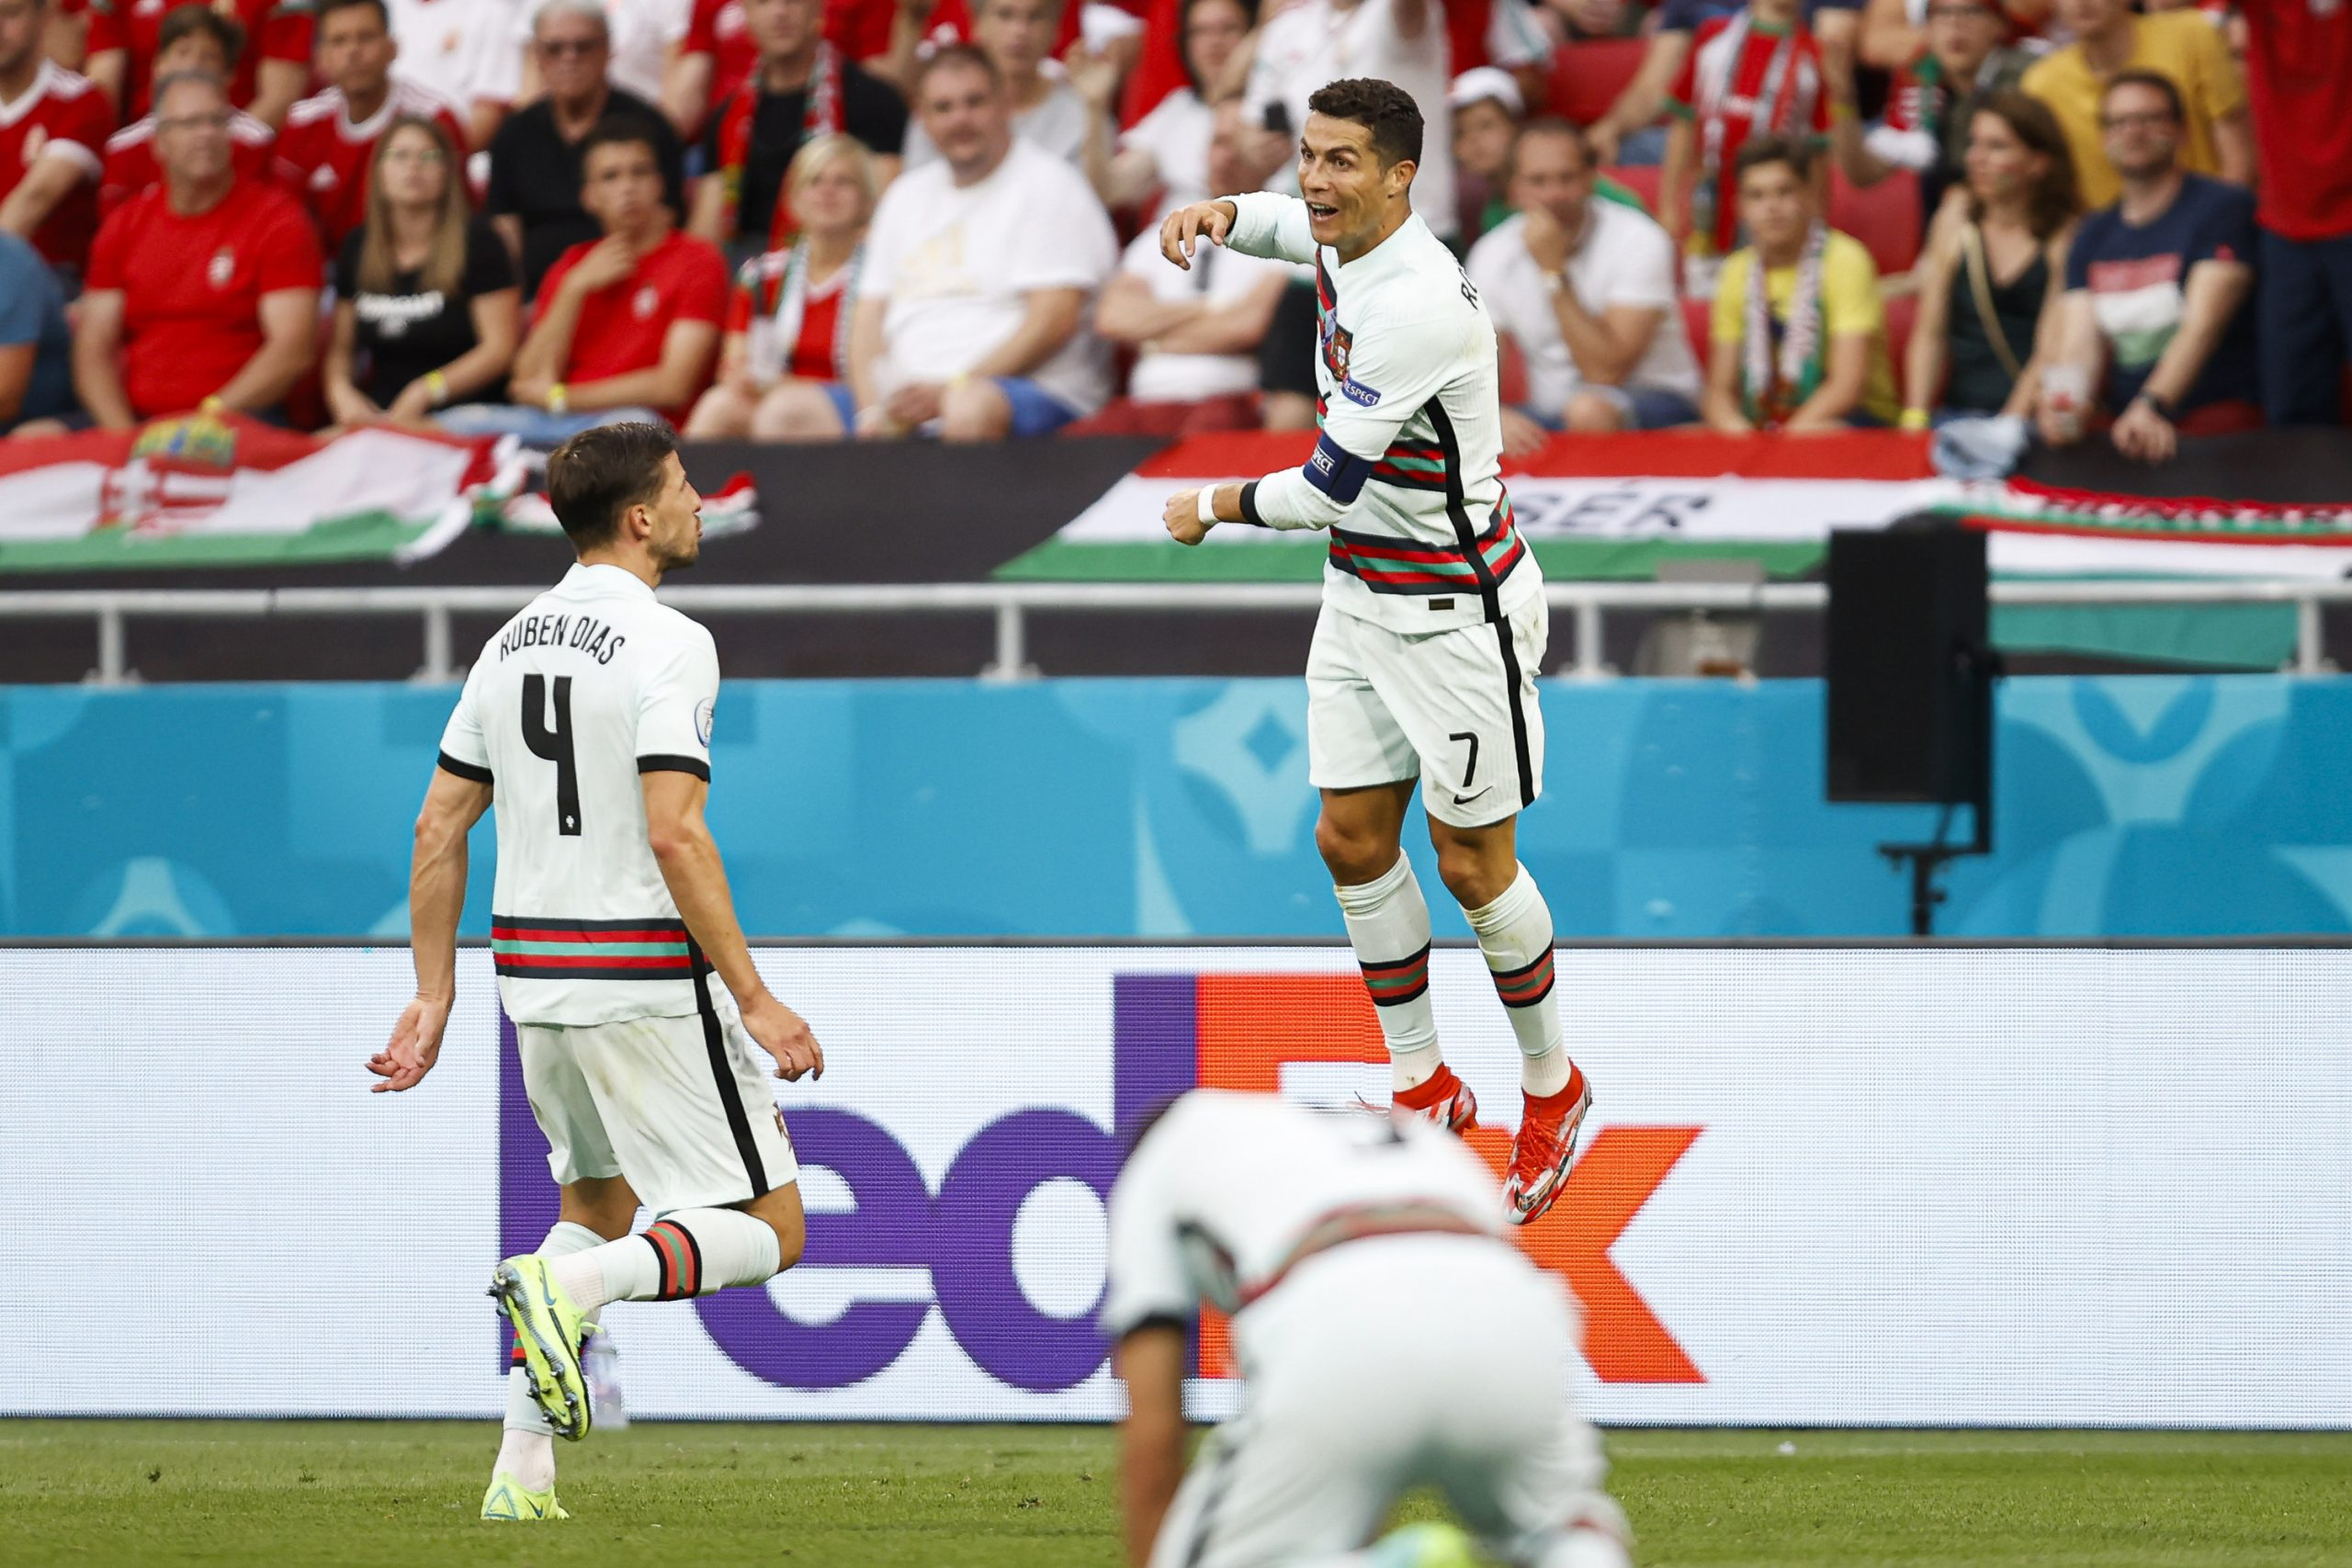 Cristiano Ronaldo. (@selecaoportugal /Twitter)